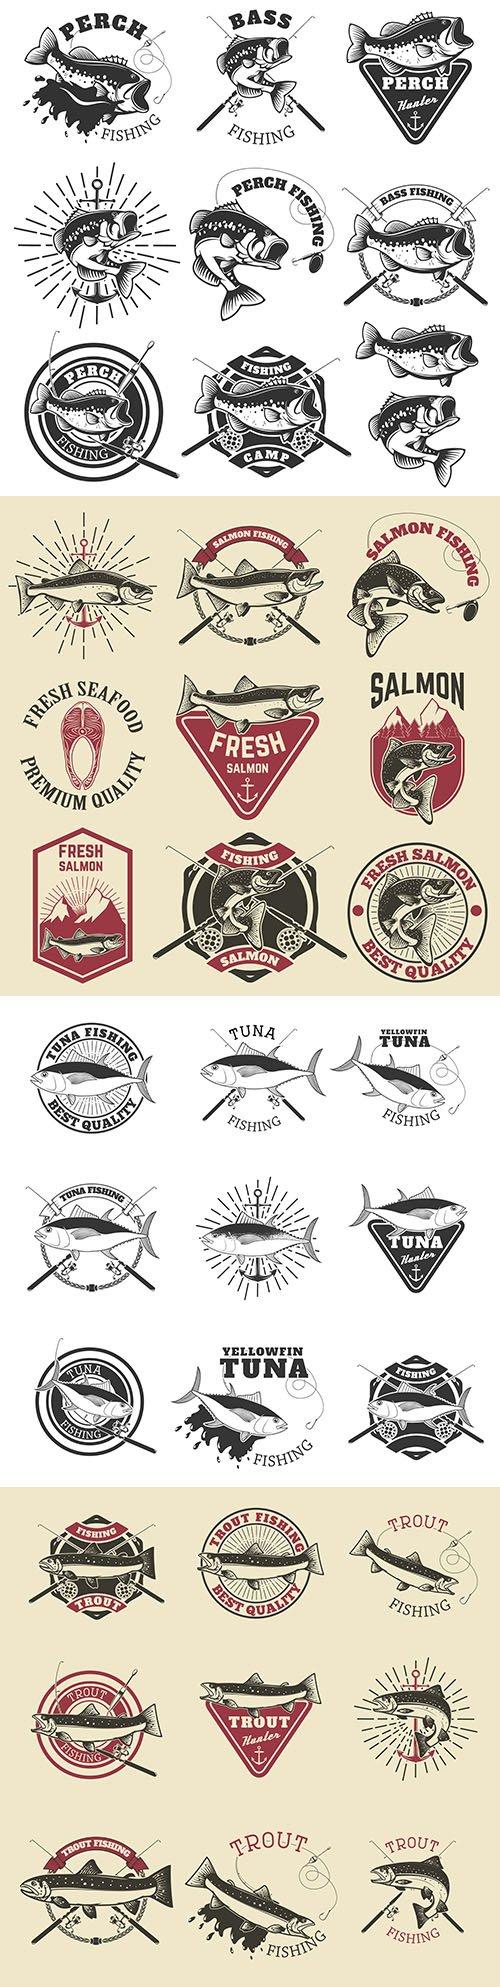 Tuna and salmon vintage emblem for fishing club